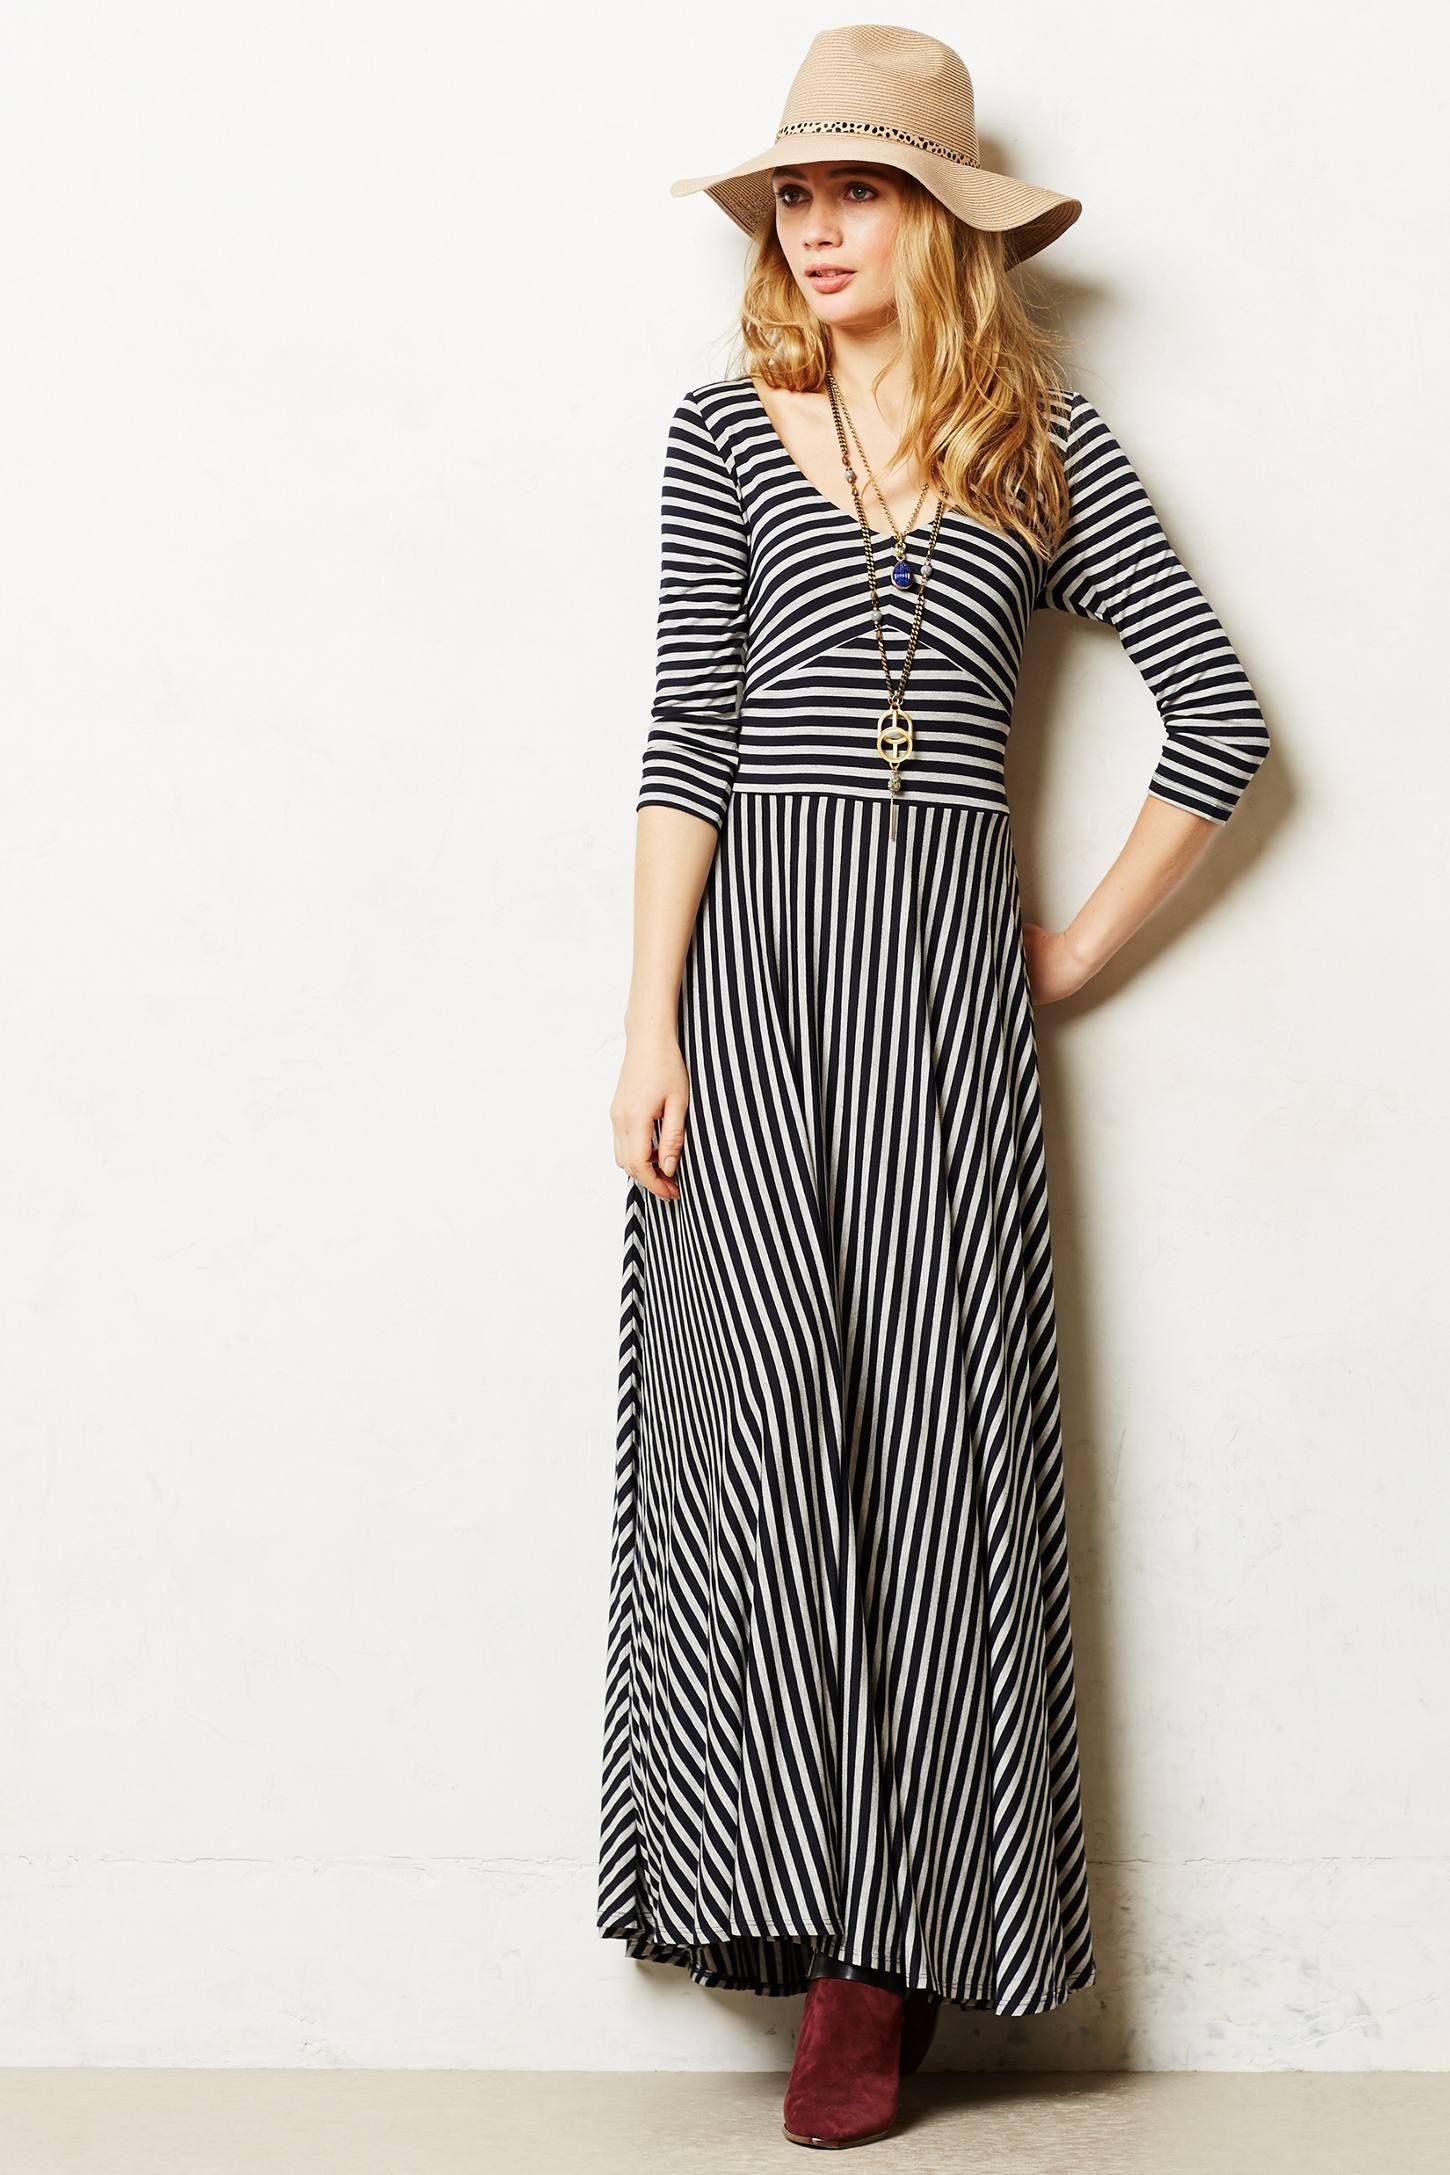 Demarcation Maxi Dress Anthropologie Com Maxi Dress Vertical Striped Dress Nice Dresses [ 2175 x 1450 Pixel ]